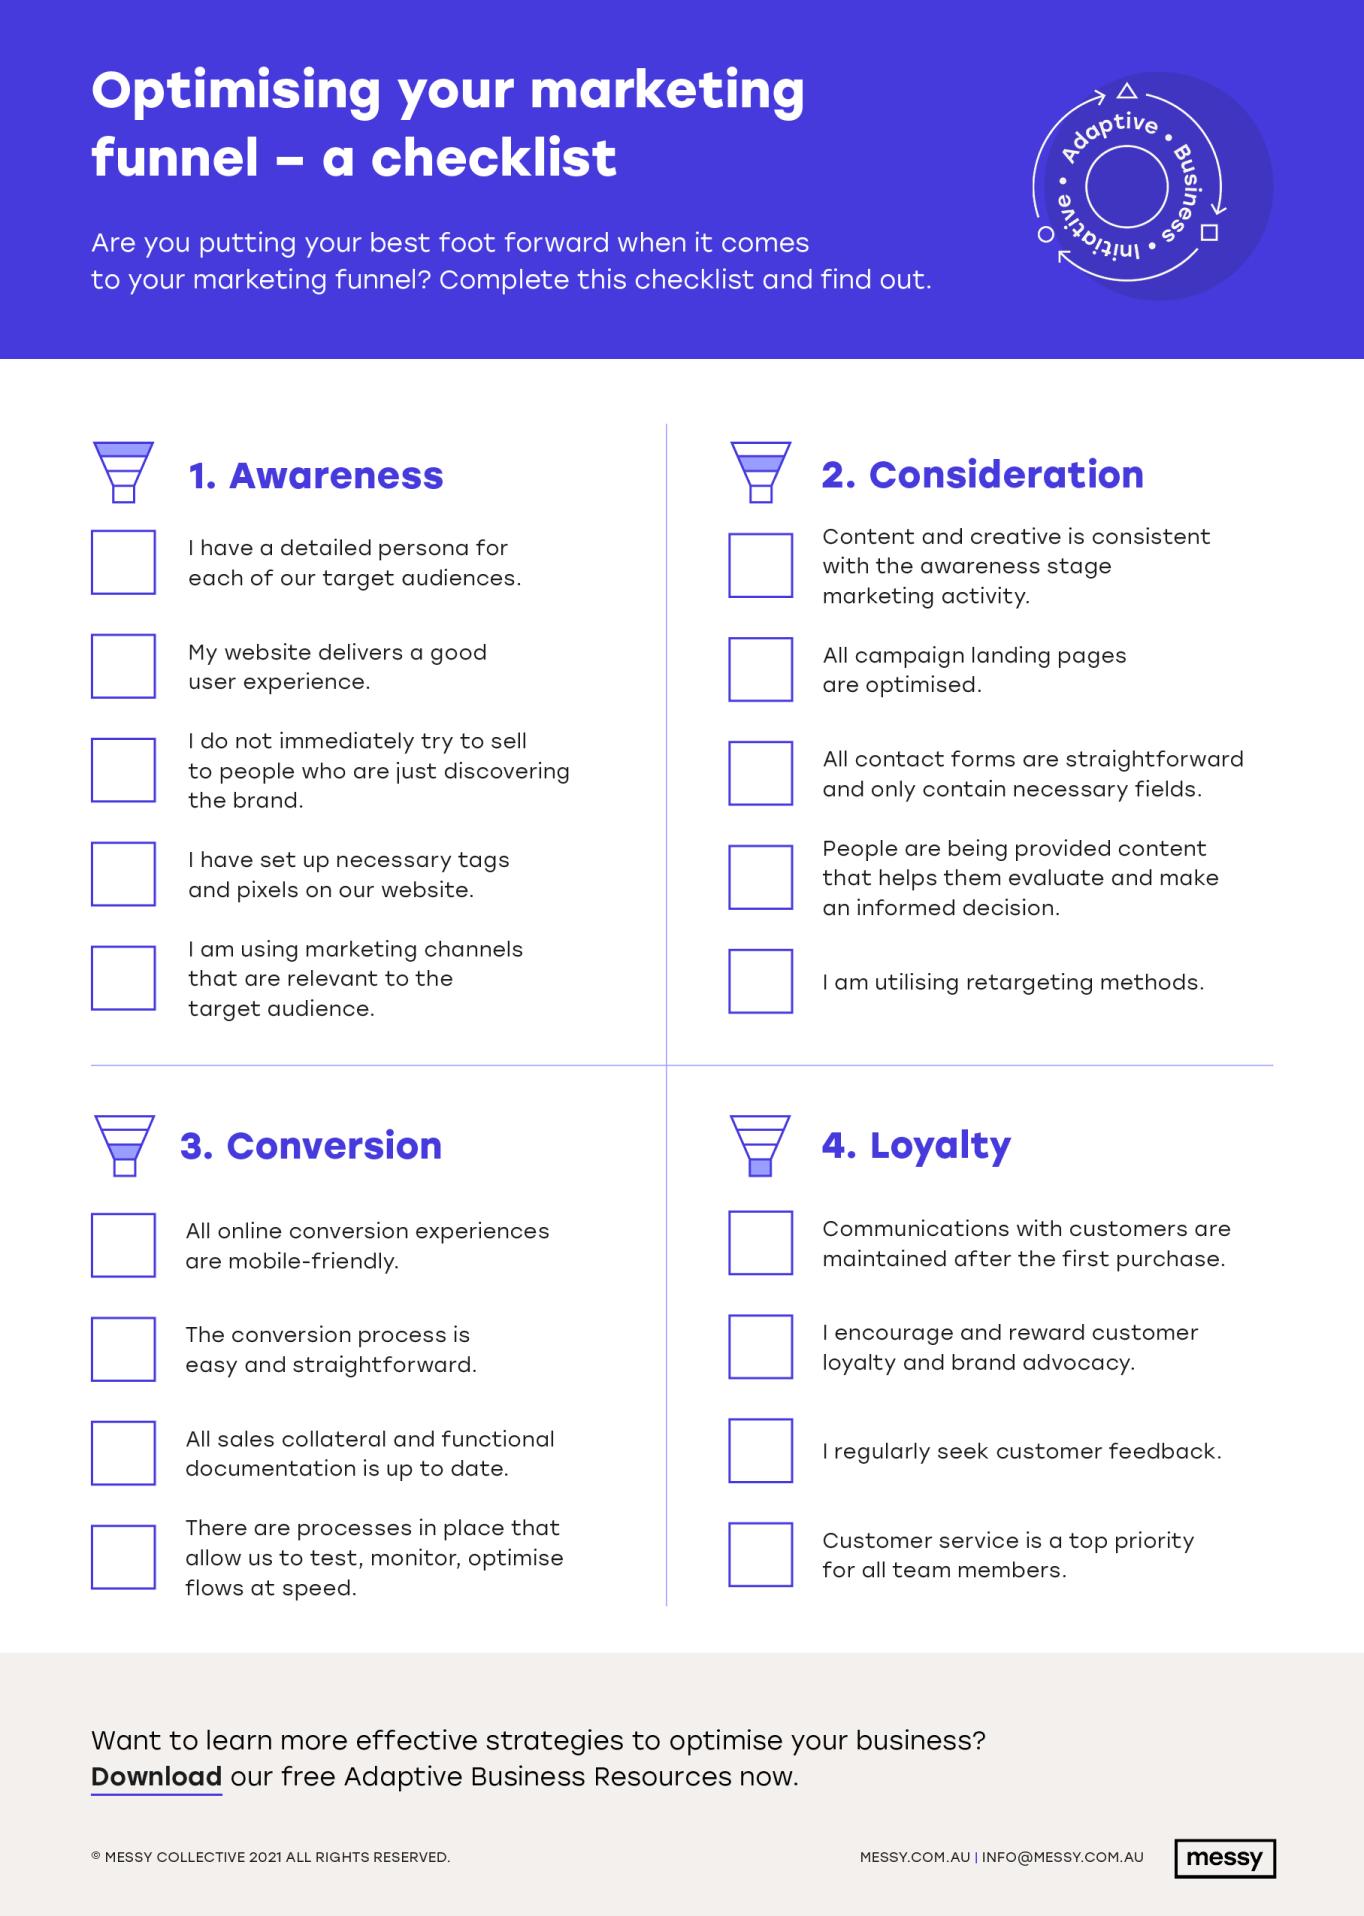 Optimising your marketing funnel checklist